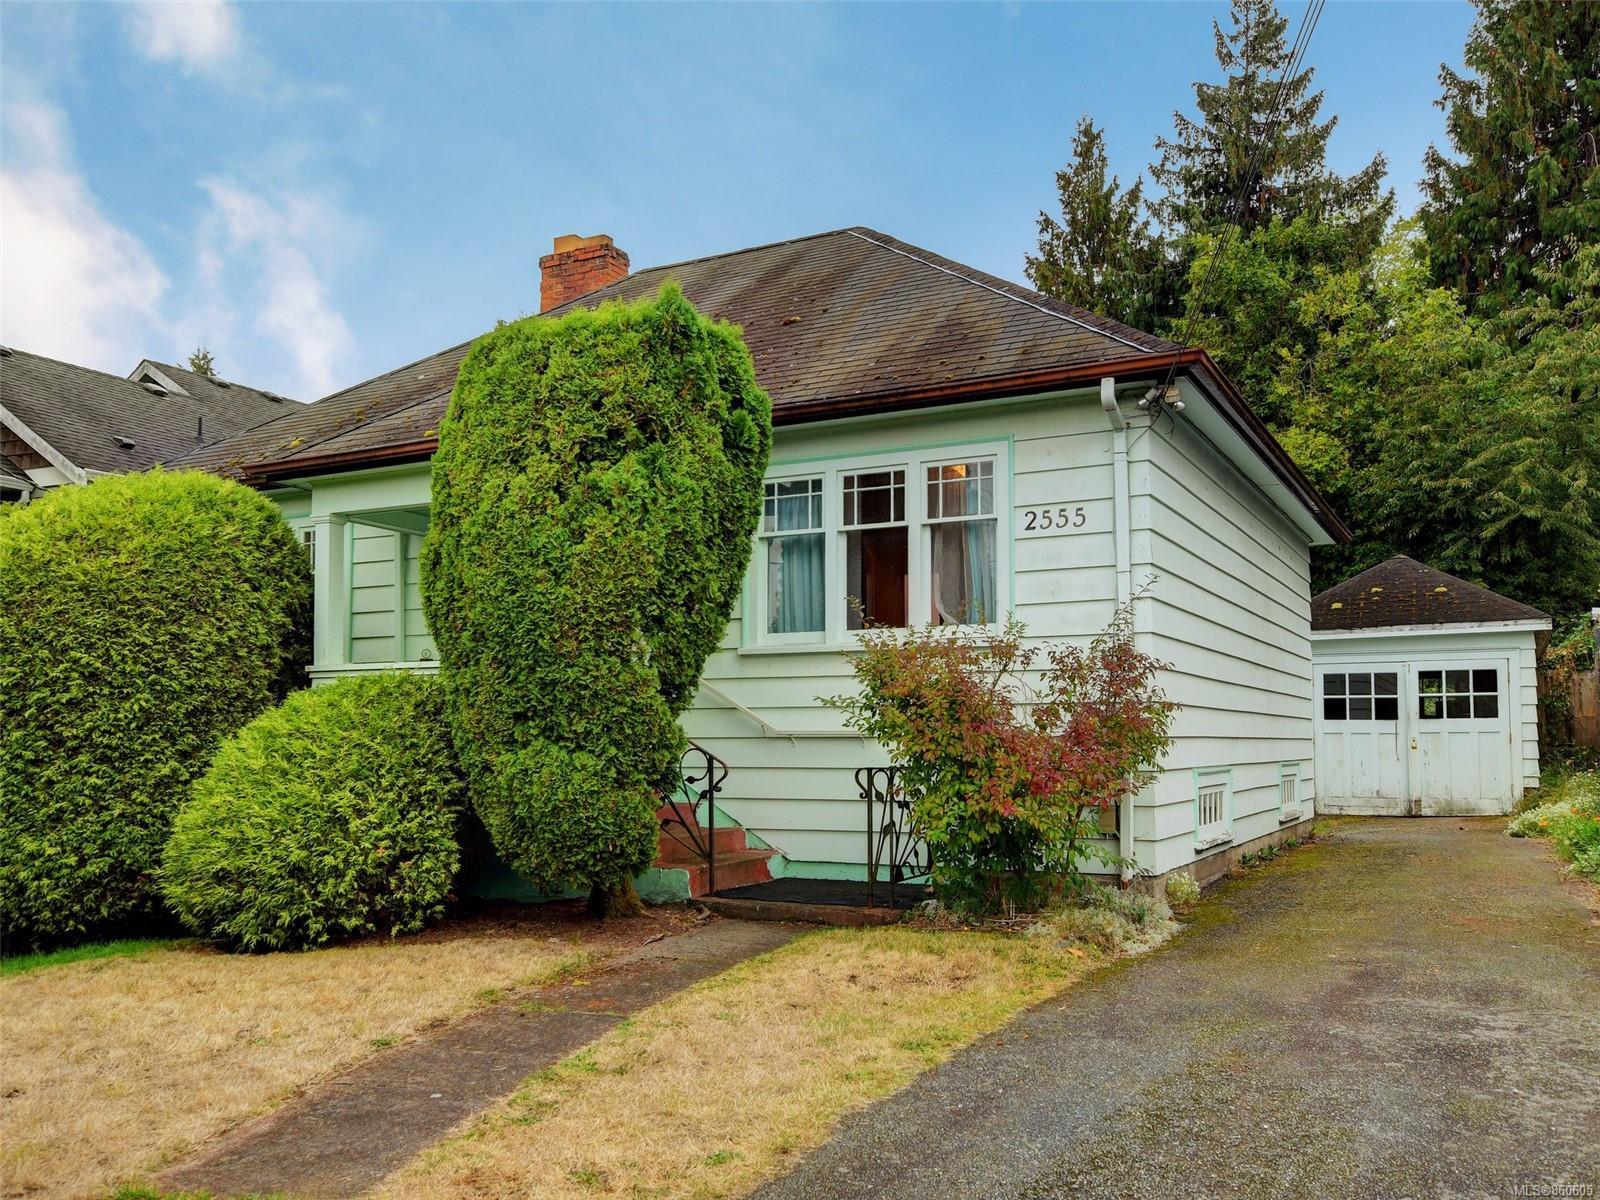 Main Photo: 2555 Sinclair Rd in : SE Cadboro Bay House for sale (Saanich East)  : MLS®# 860605